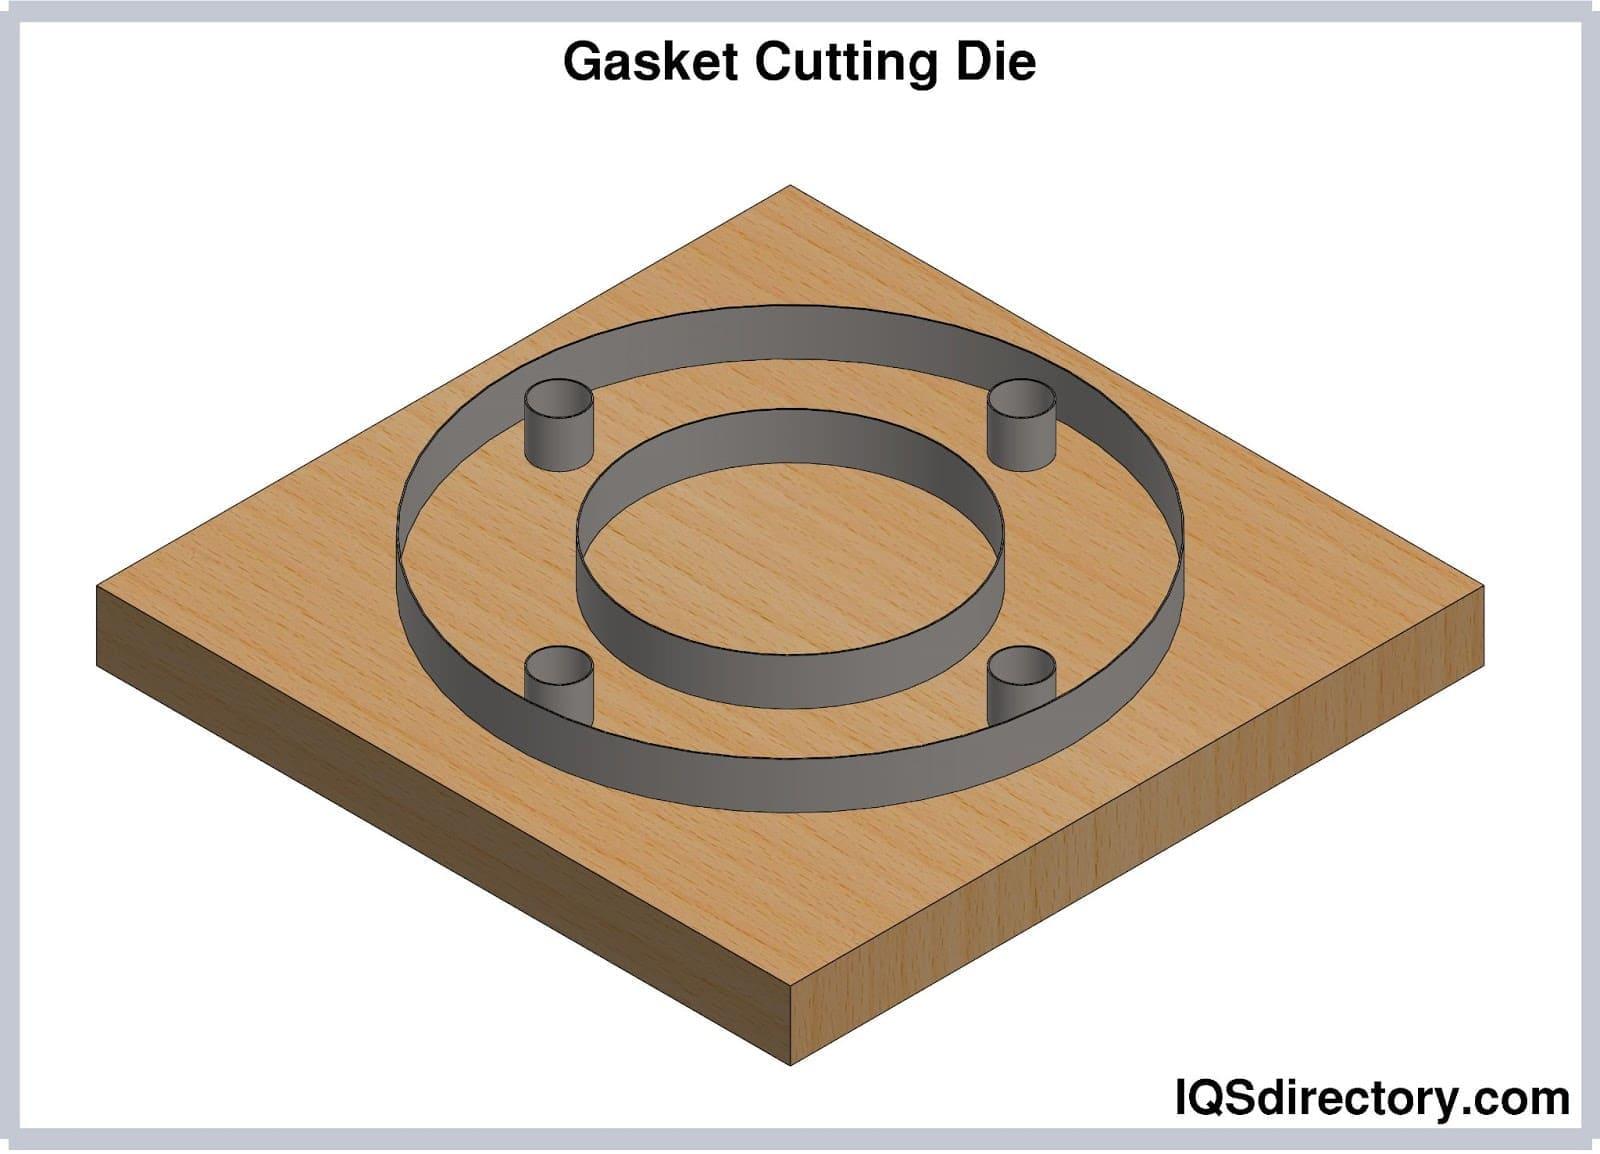 Gasket Cutting Die